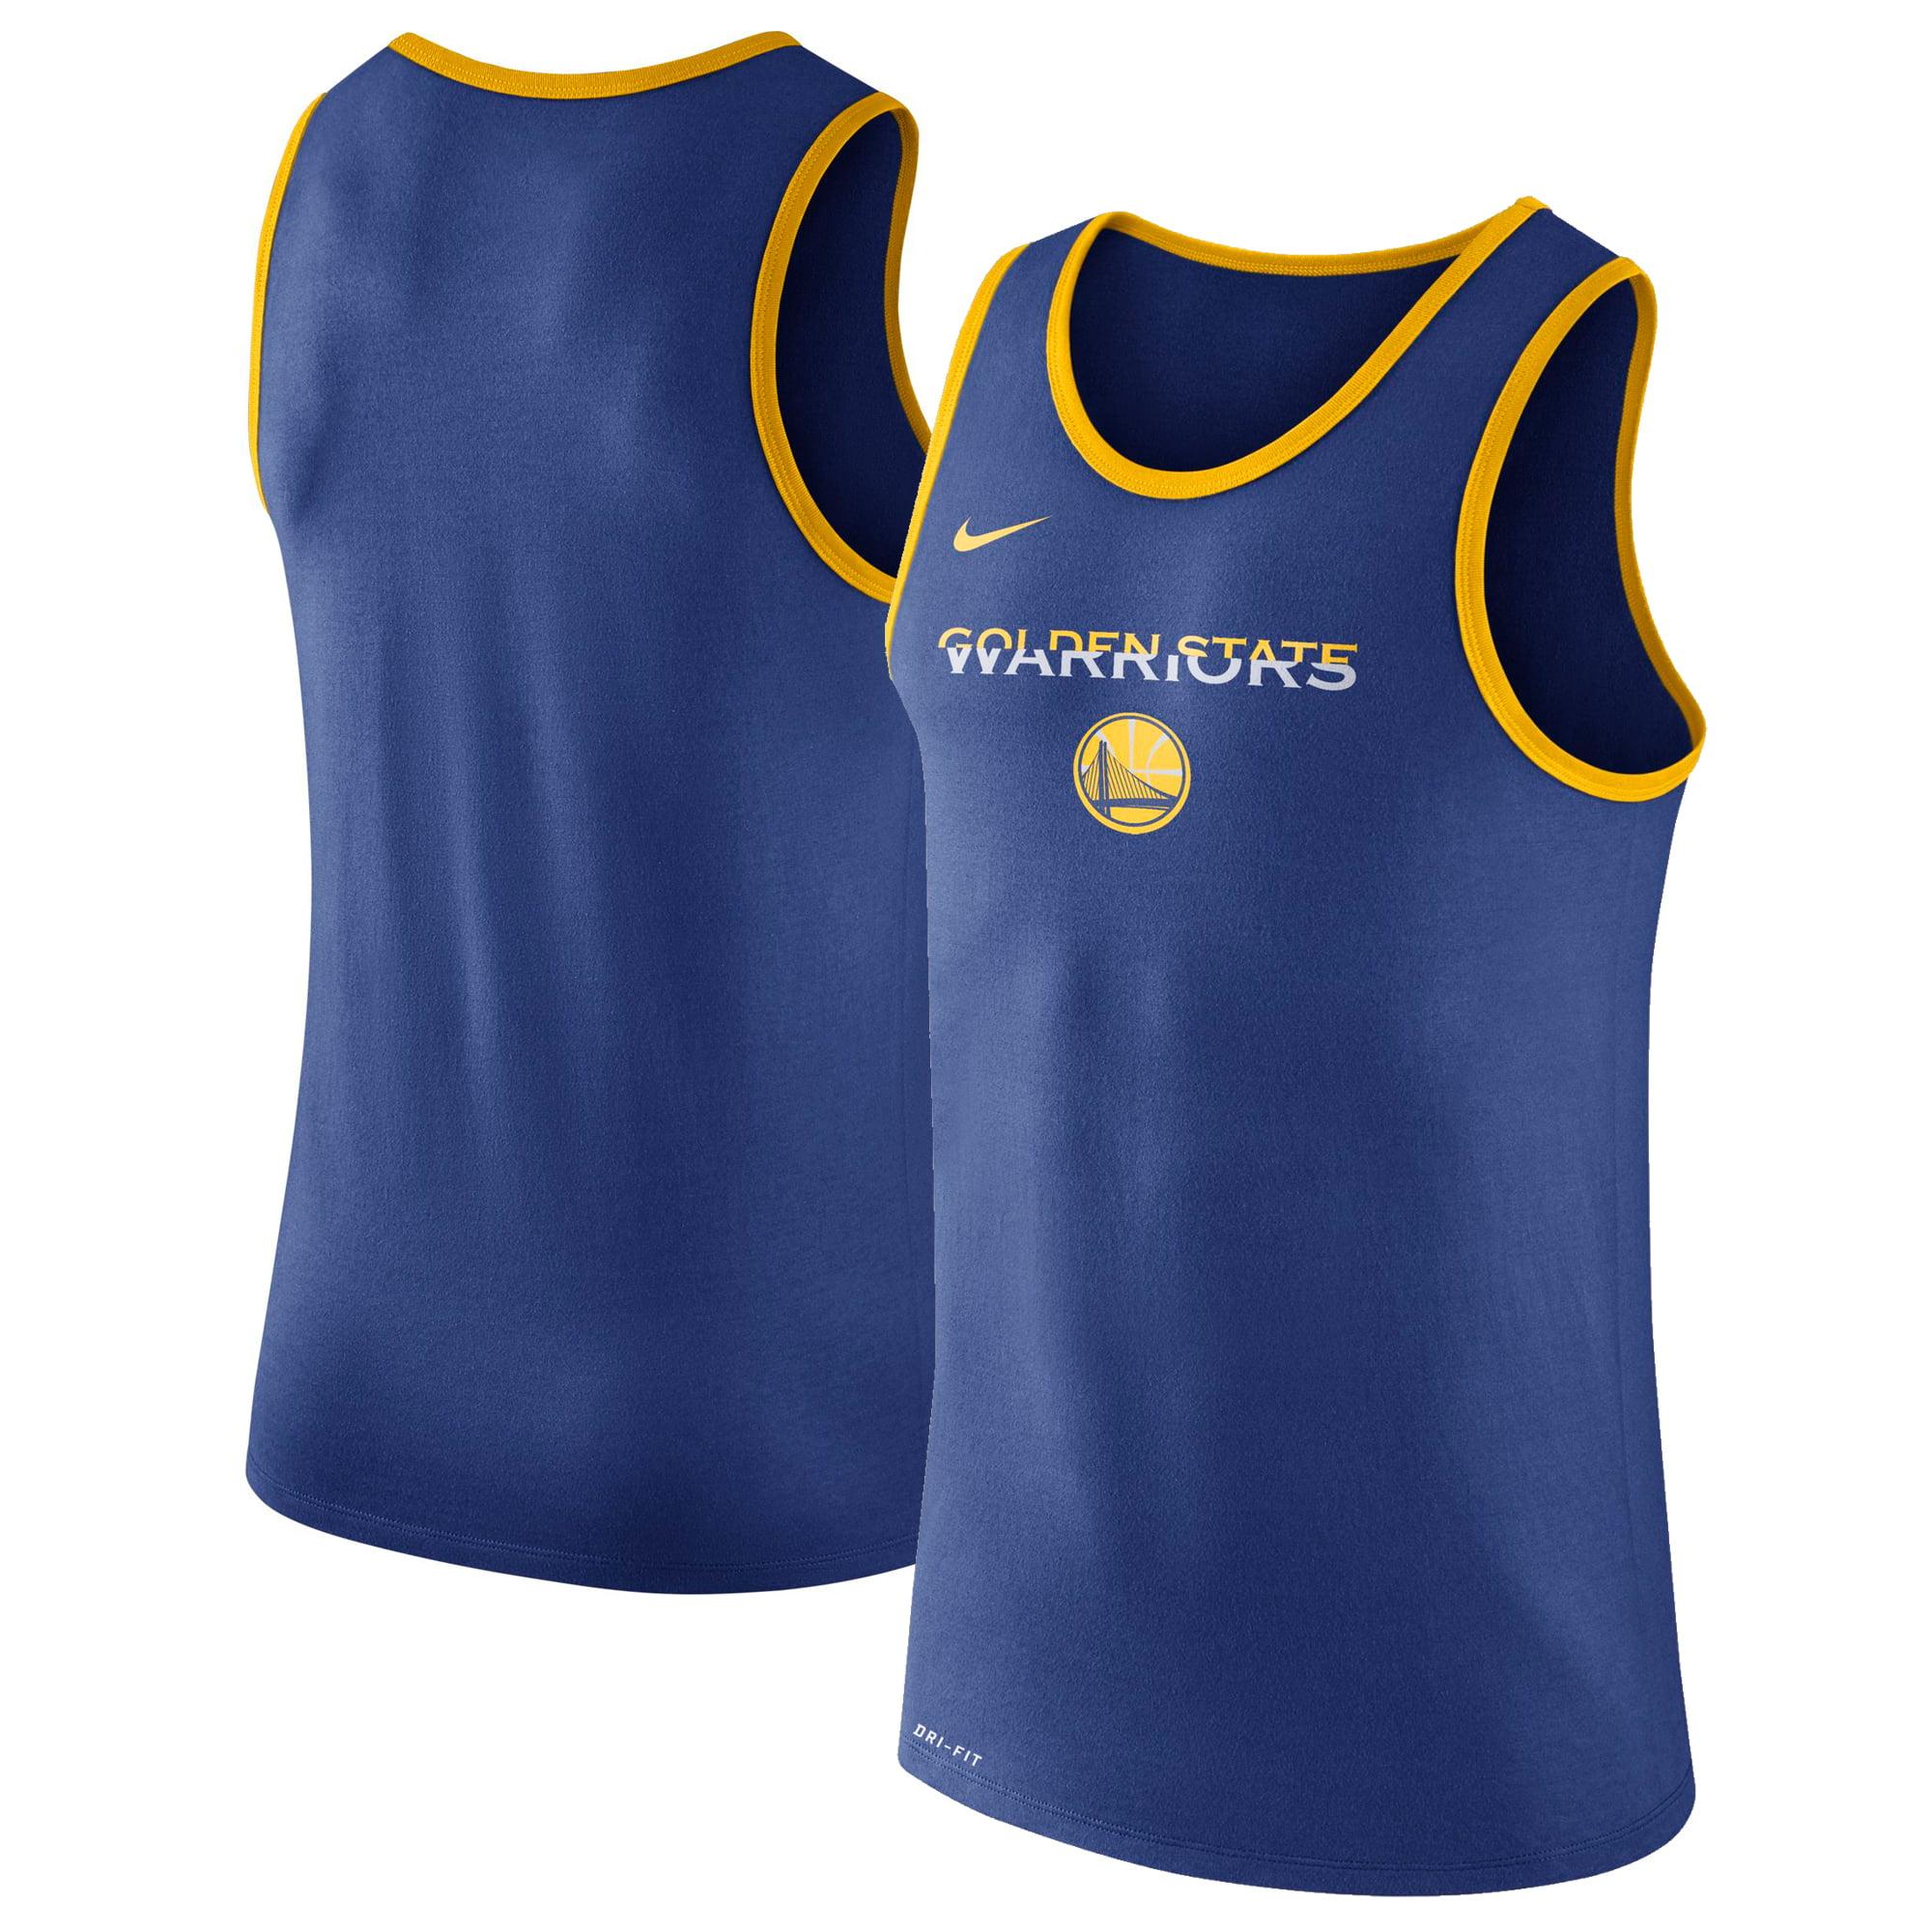 Golden State Warriors Nike Logo Performance Tank Top - Royal